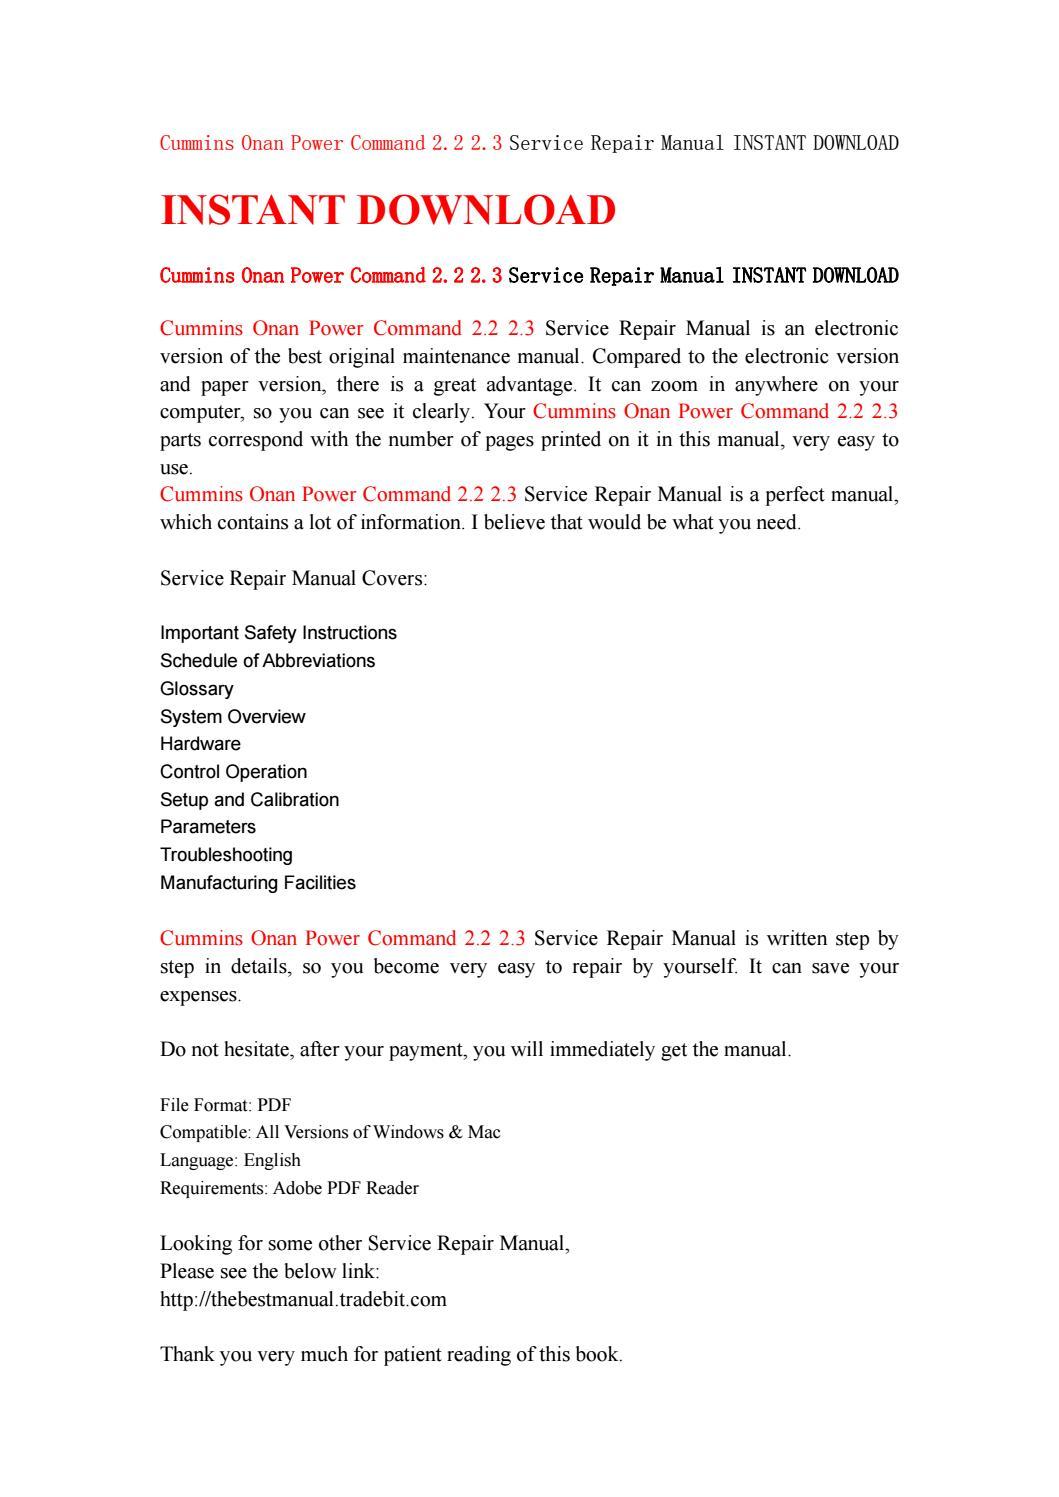 Cummins onan power command 2 2 2 3 service repair manual instant download  by ksfsen7duf - issuu